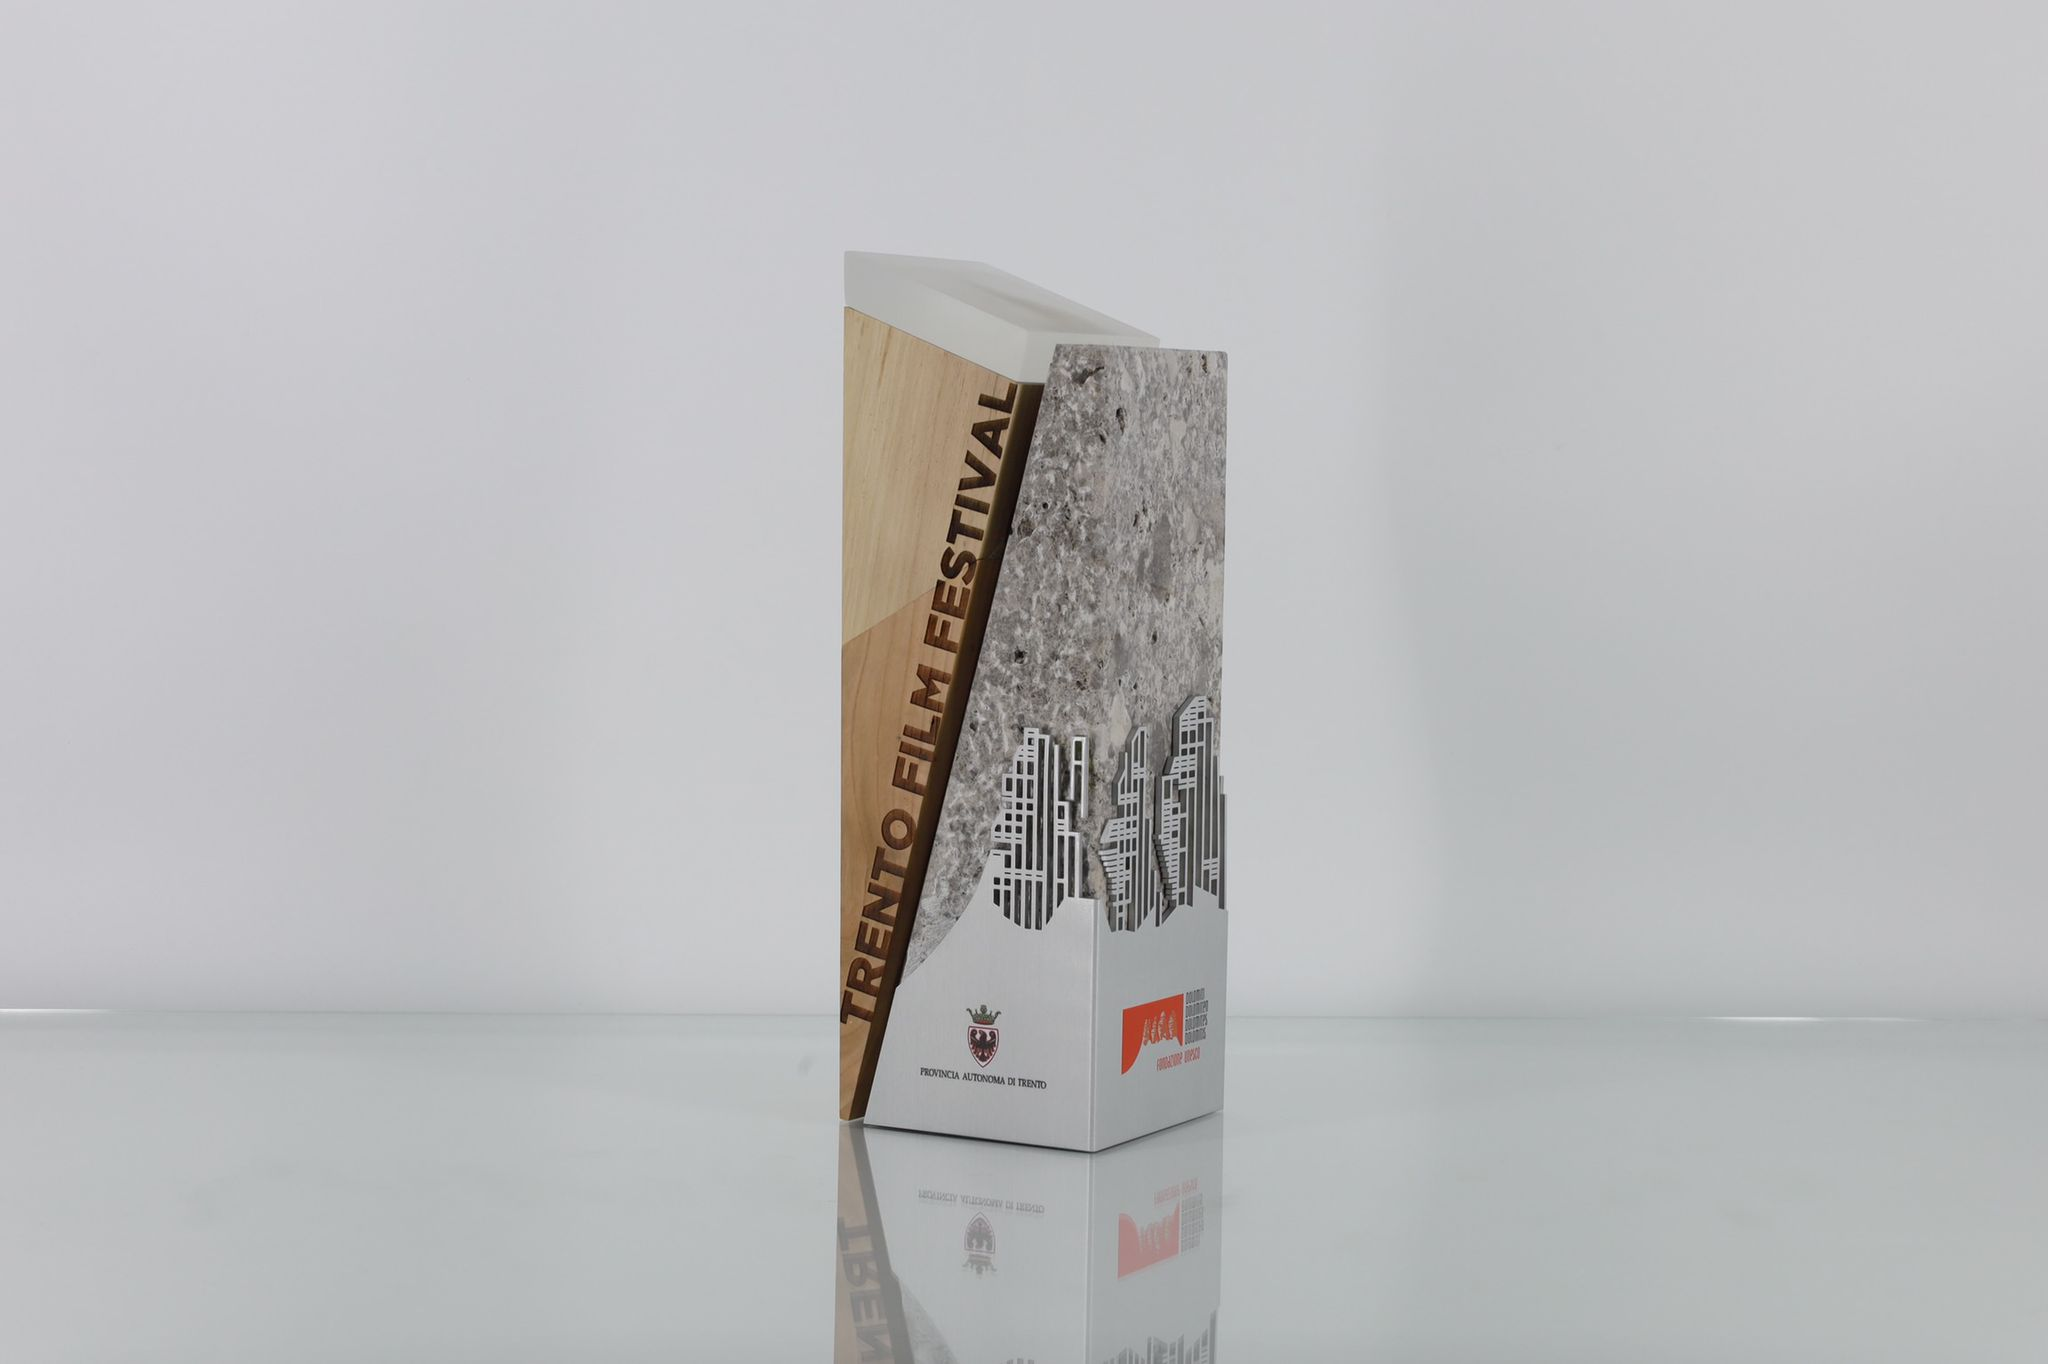 premio-speciale-dolomiti-unesco-trentofilm-festival